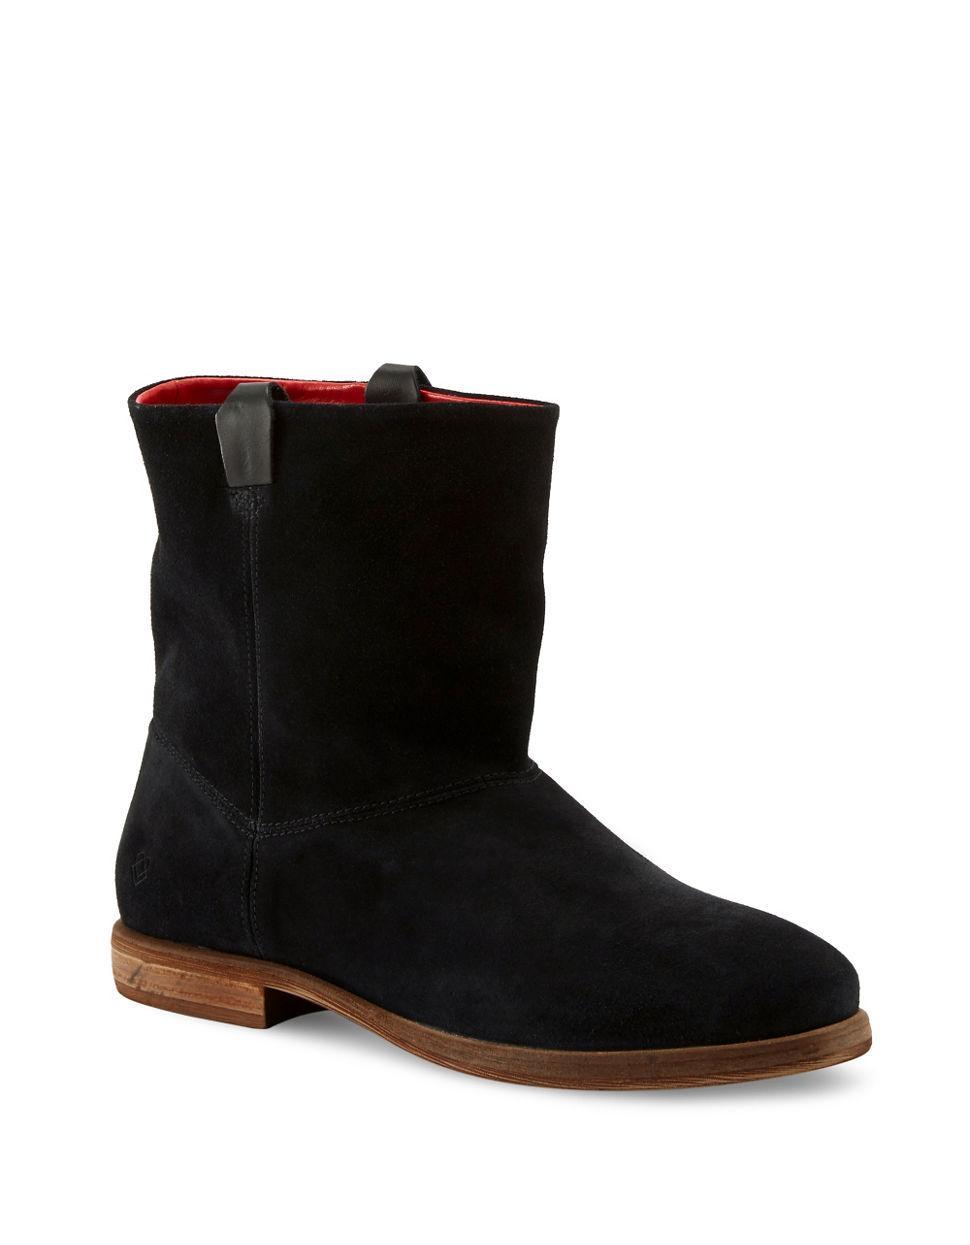 liebeskind berlin round toe suede ankle boots in black lyst. Black Bedroom Furniture Sets. Home Design Ideas